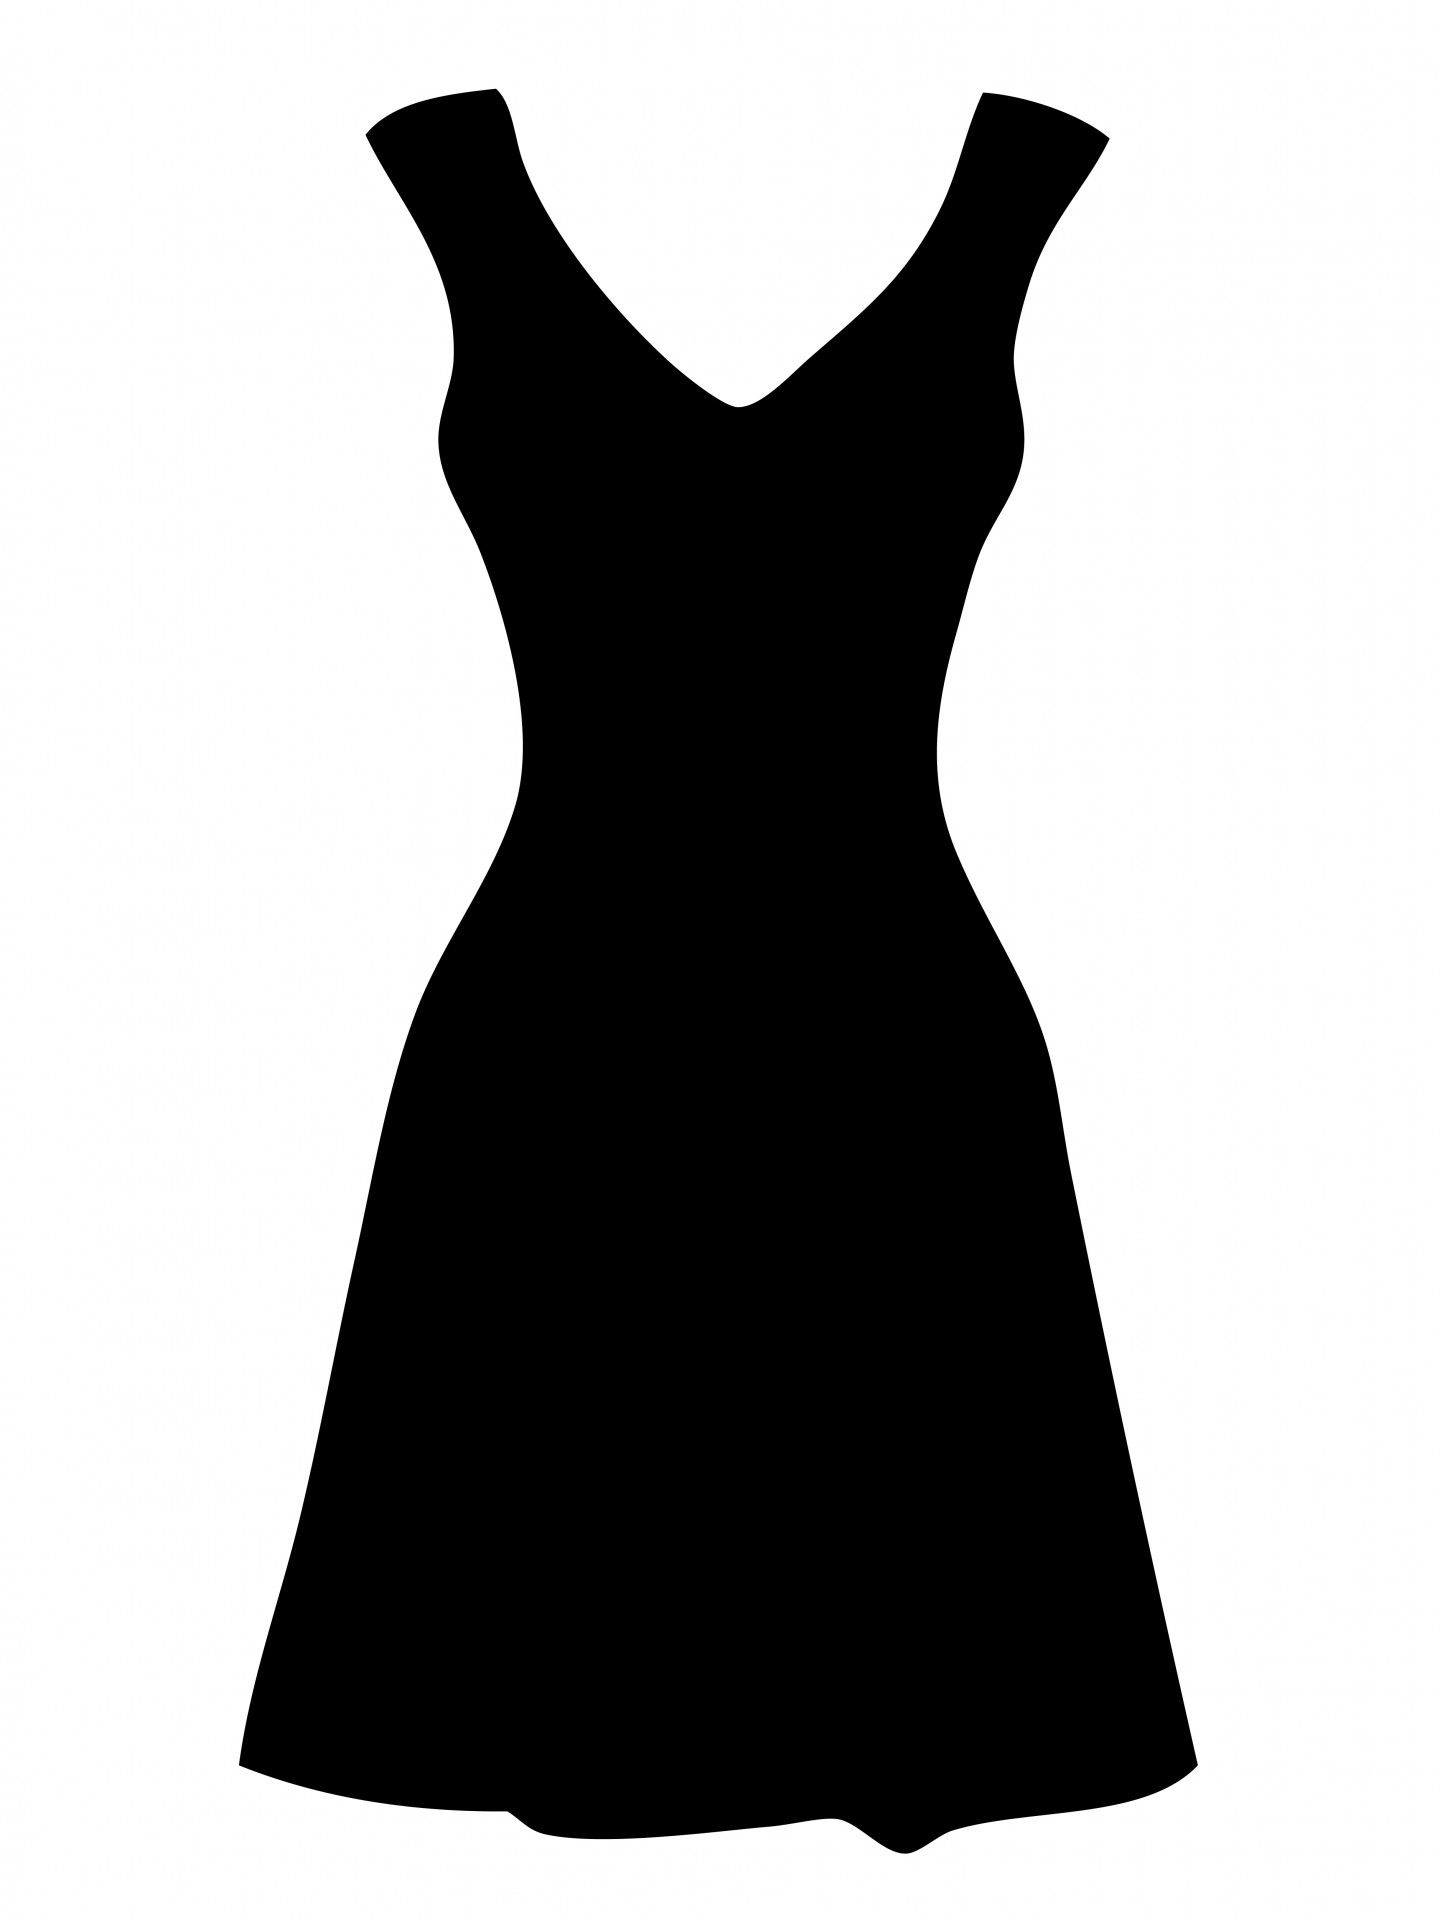 free clipart of dresses black dress clipart by karen arnold rh pinterest com dress clipart image dress clipart png